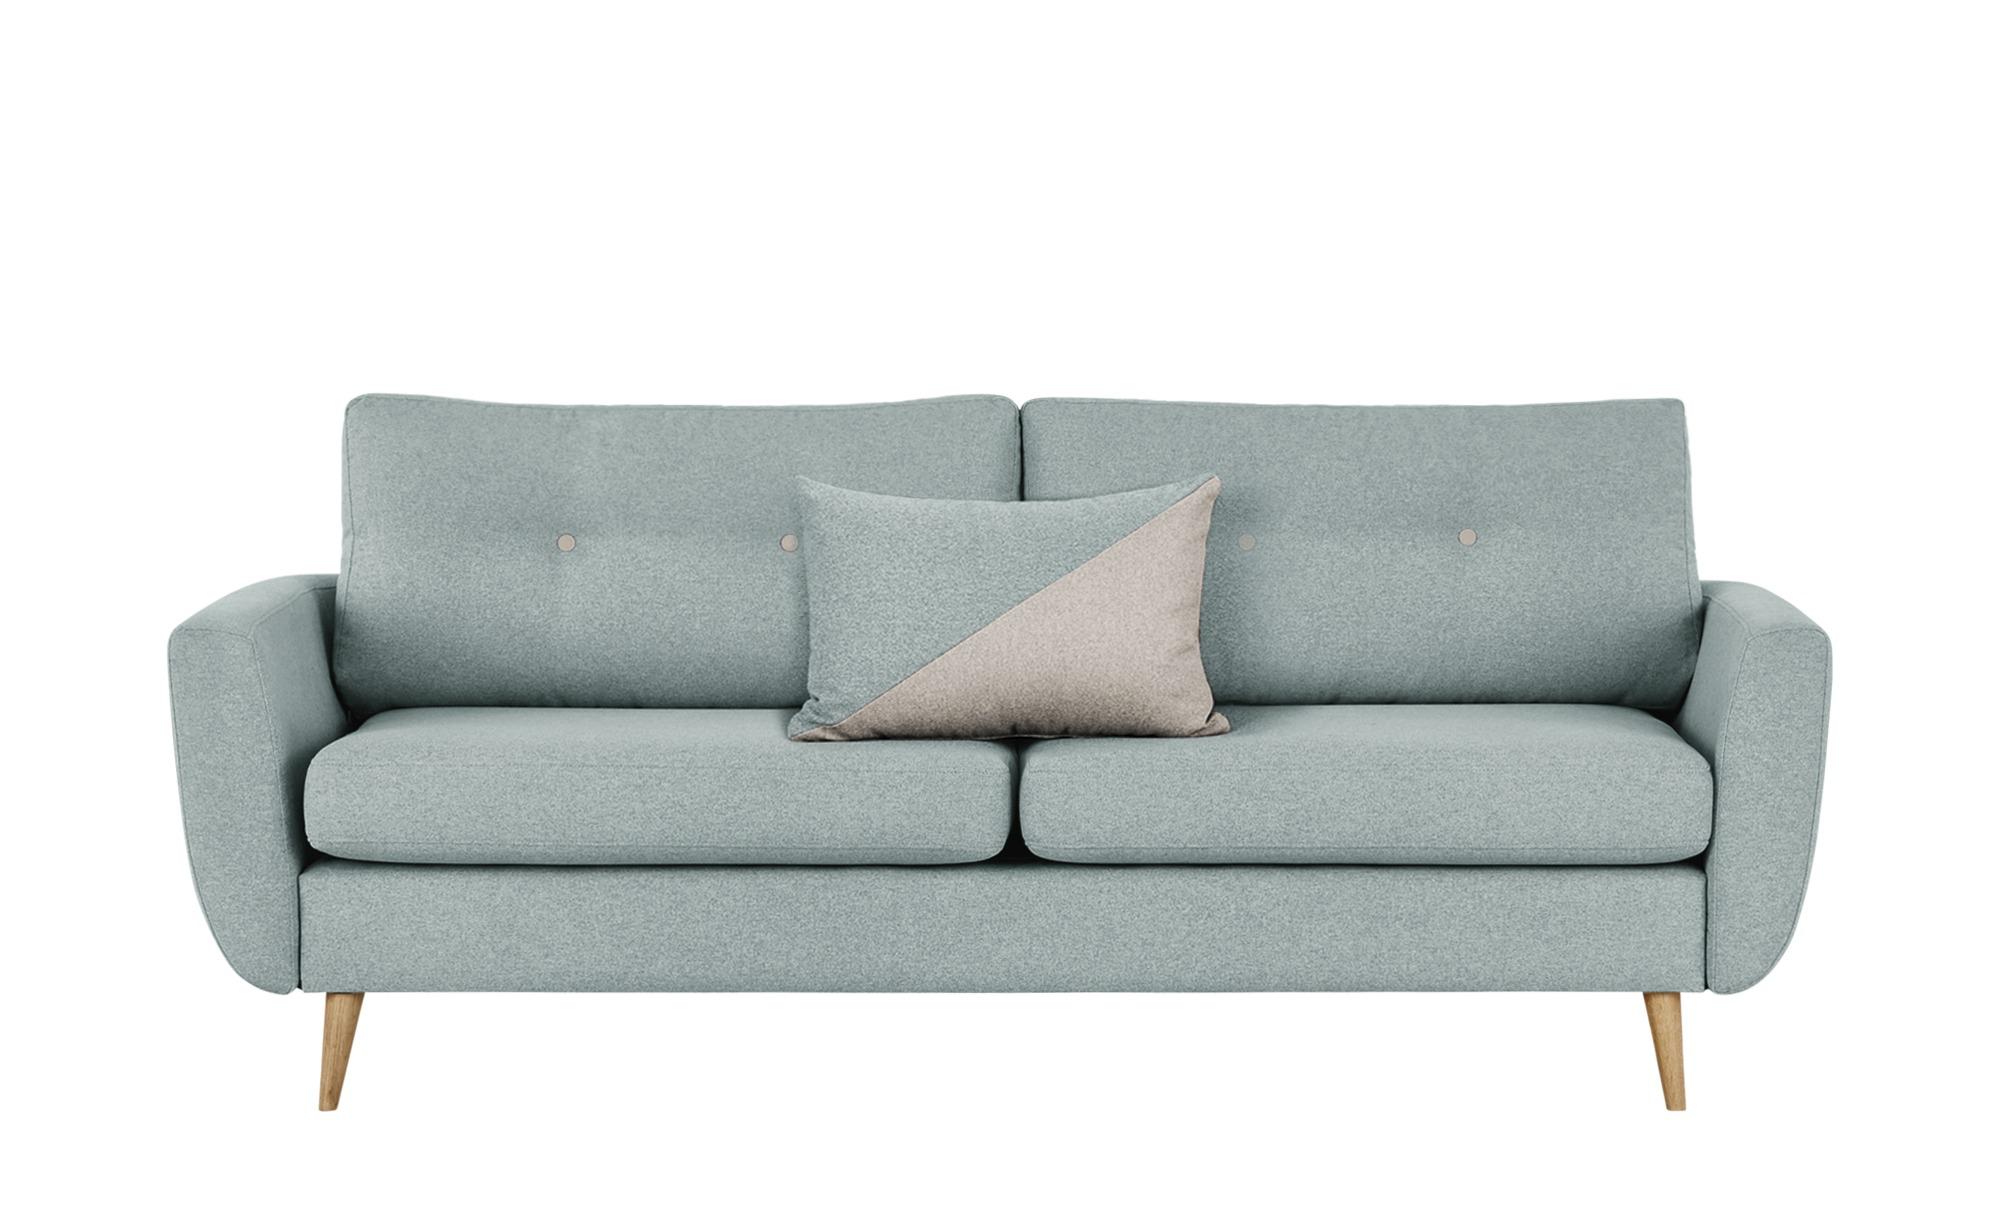 finya Retro-Sofa 3-sitzig mintgrün - Webstoff Harris ¦ blau ¦ Maße (cm): B: 207 H: 85 T: 92 Polstermöbel > Sofas > 3-Sitzer - Höffner